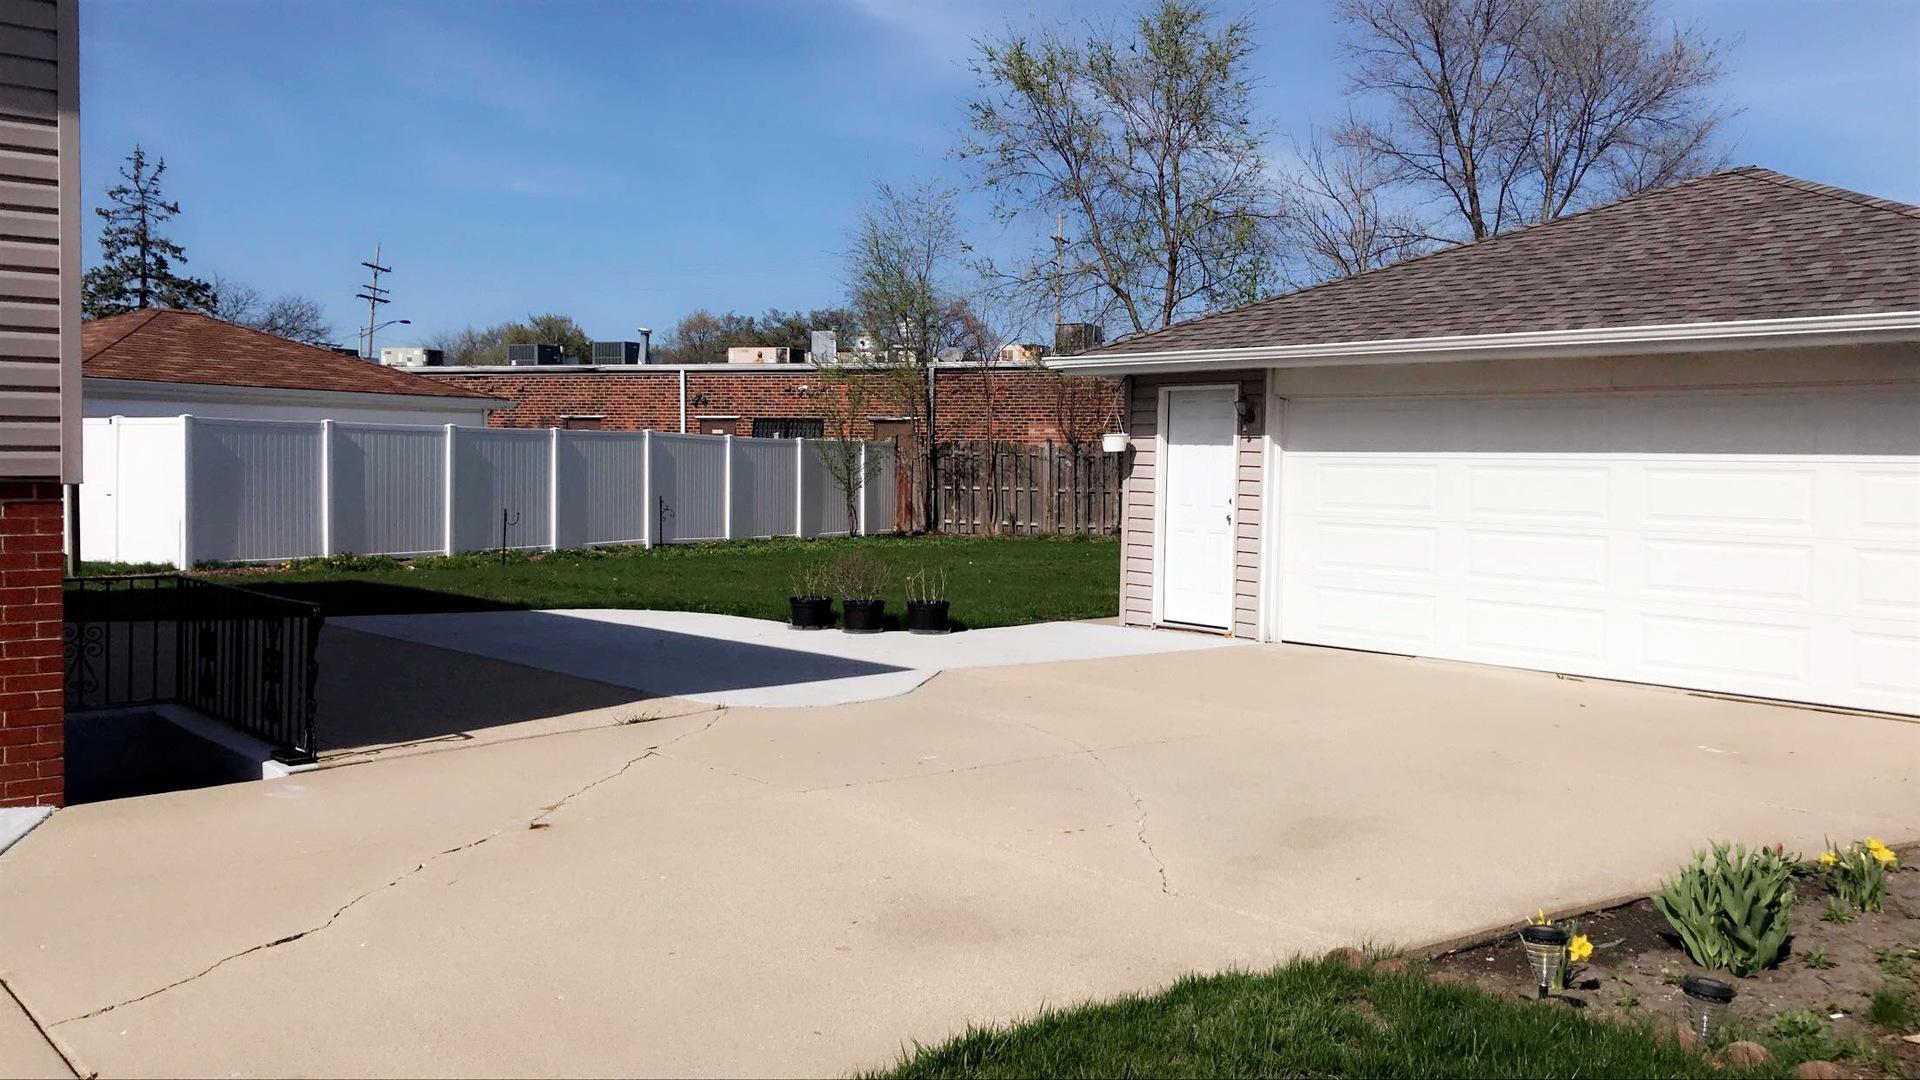 9009 North Joey, NILES, Illinois, 60714